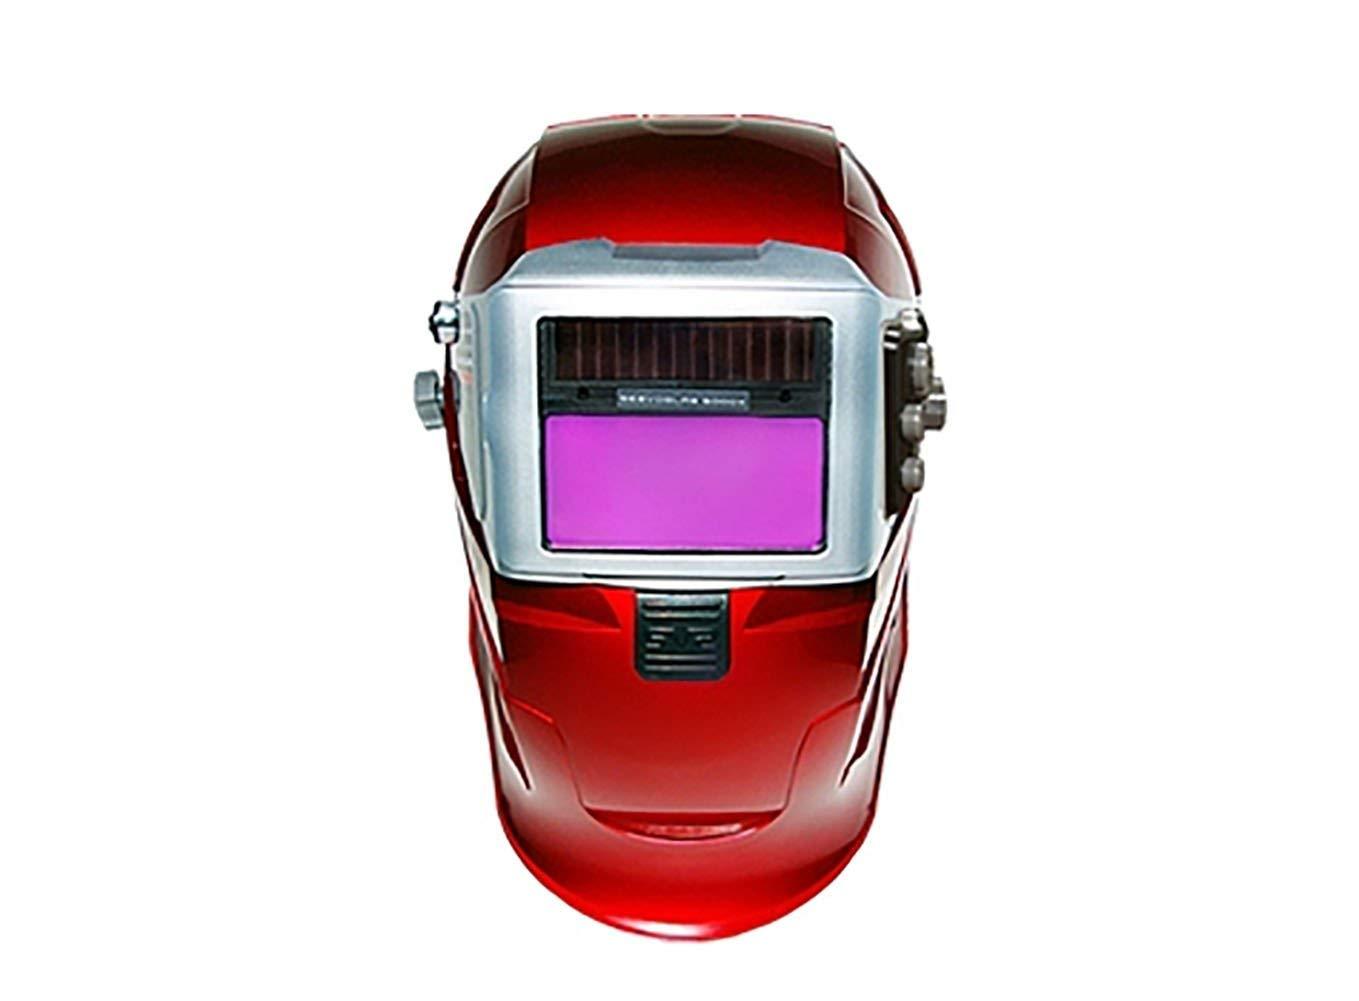 SERVORE 5000X - Slide Welding Helmet Welding Visor One-touch Auto Shade Automatic Darkening Extra Wide View Type (Red)